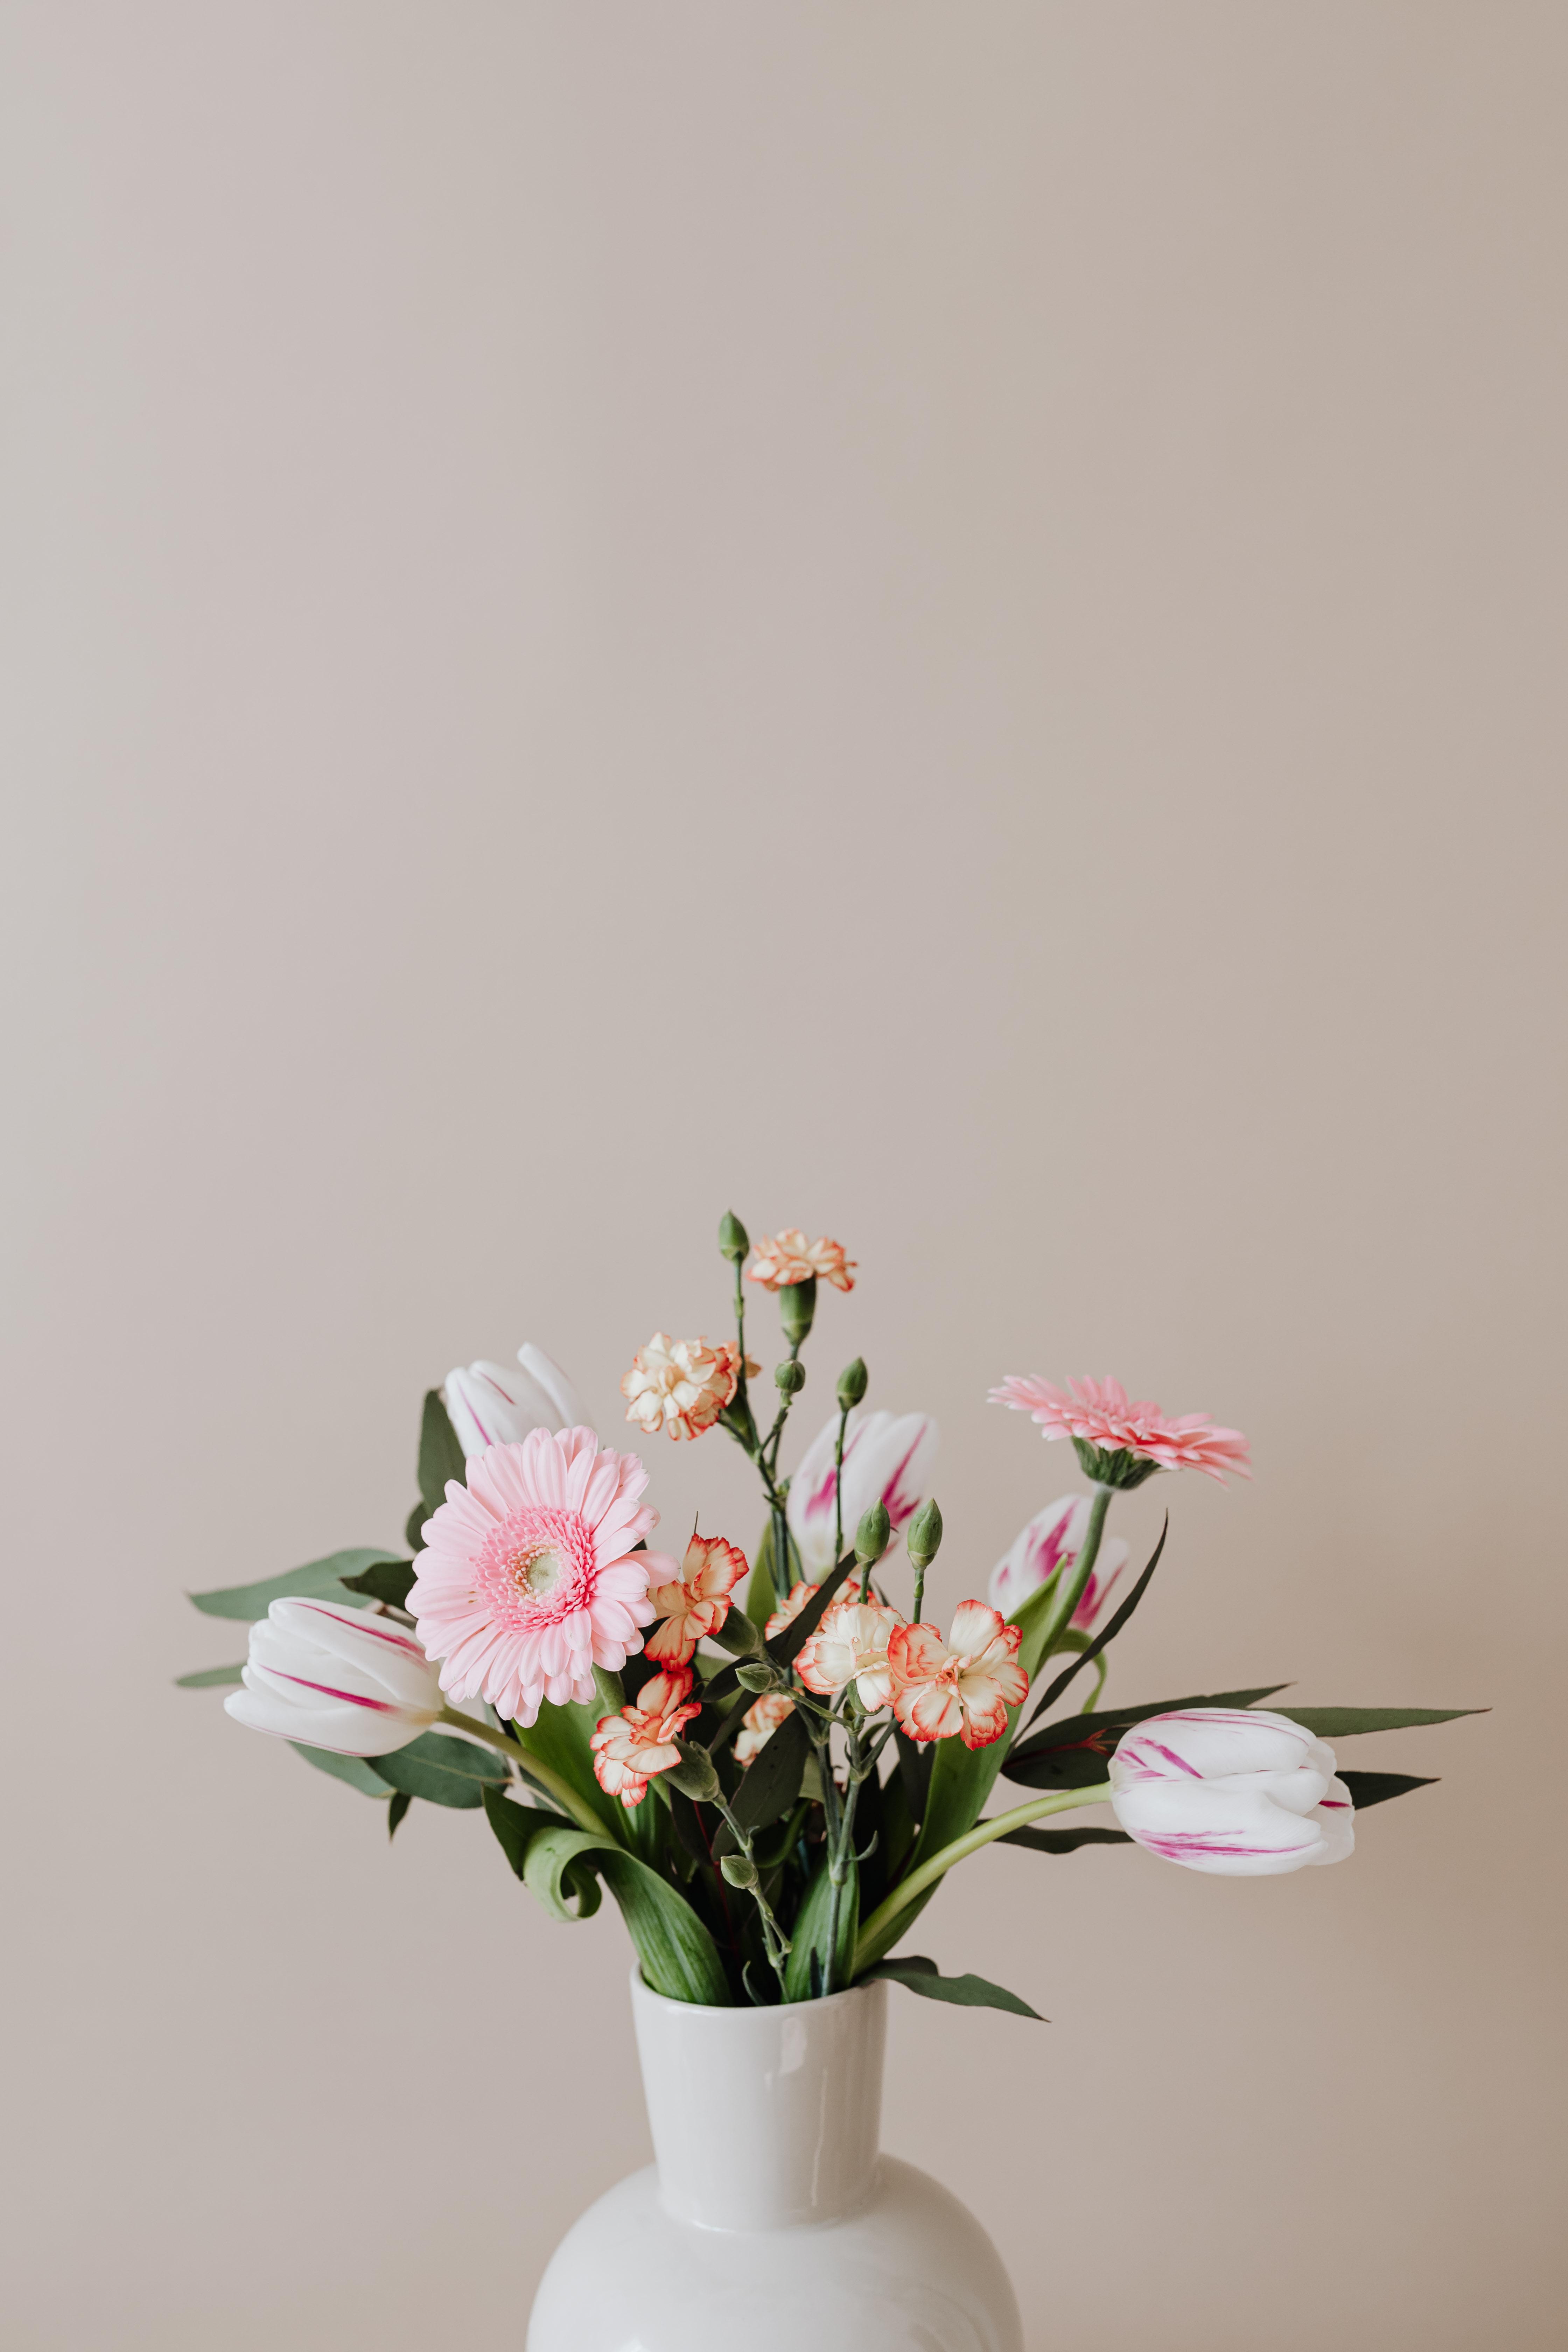 white ceramic vase with fresh flowers